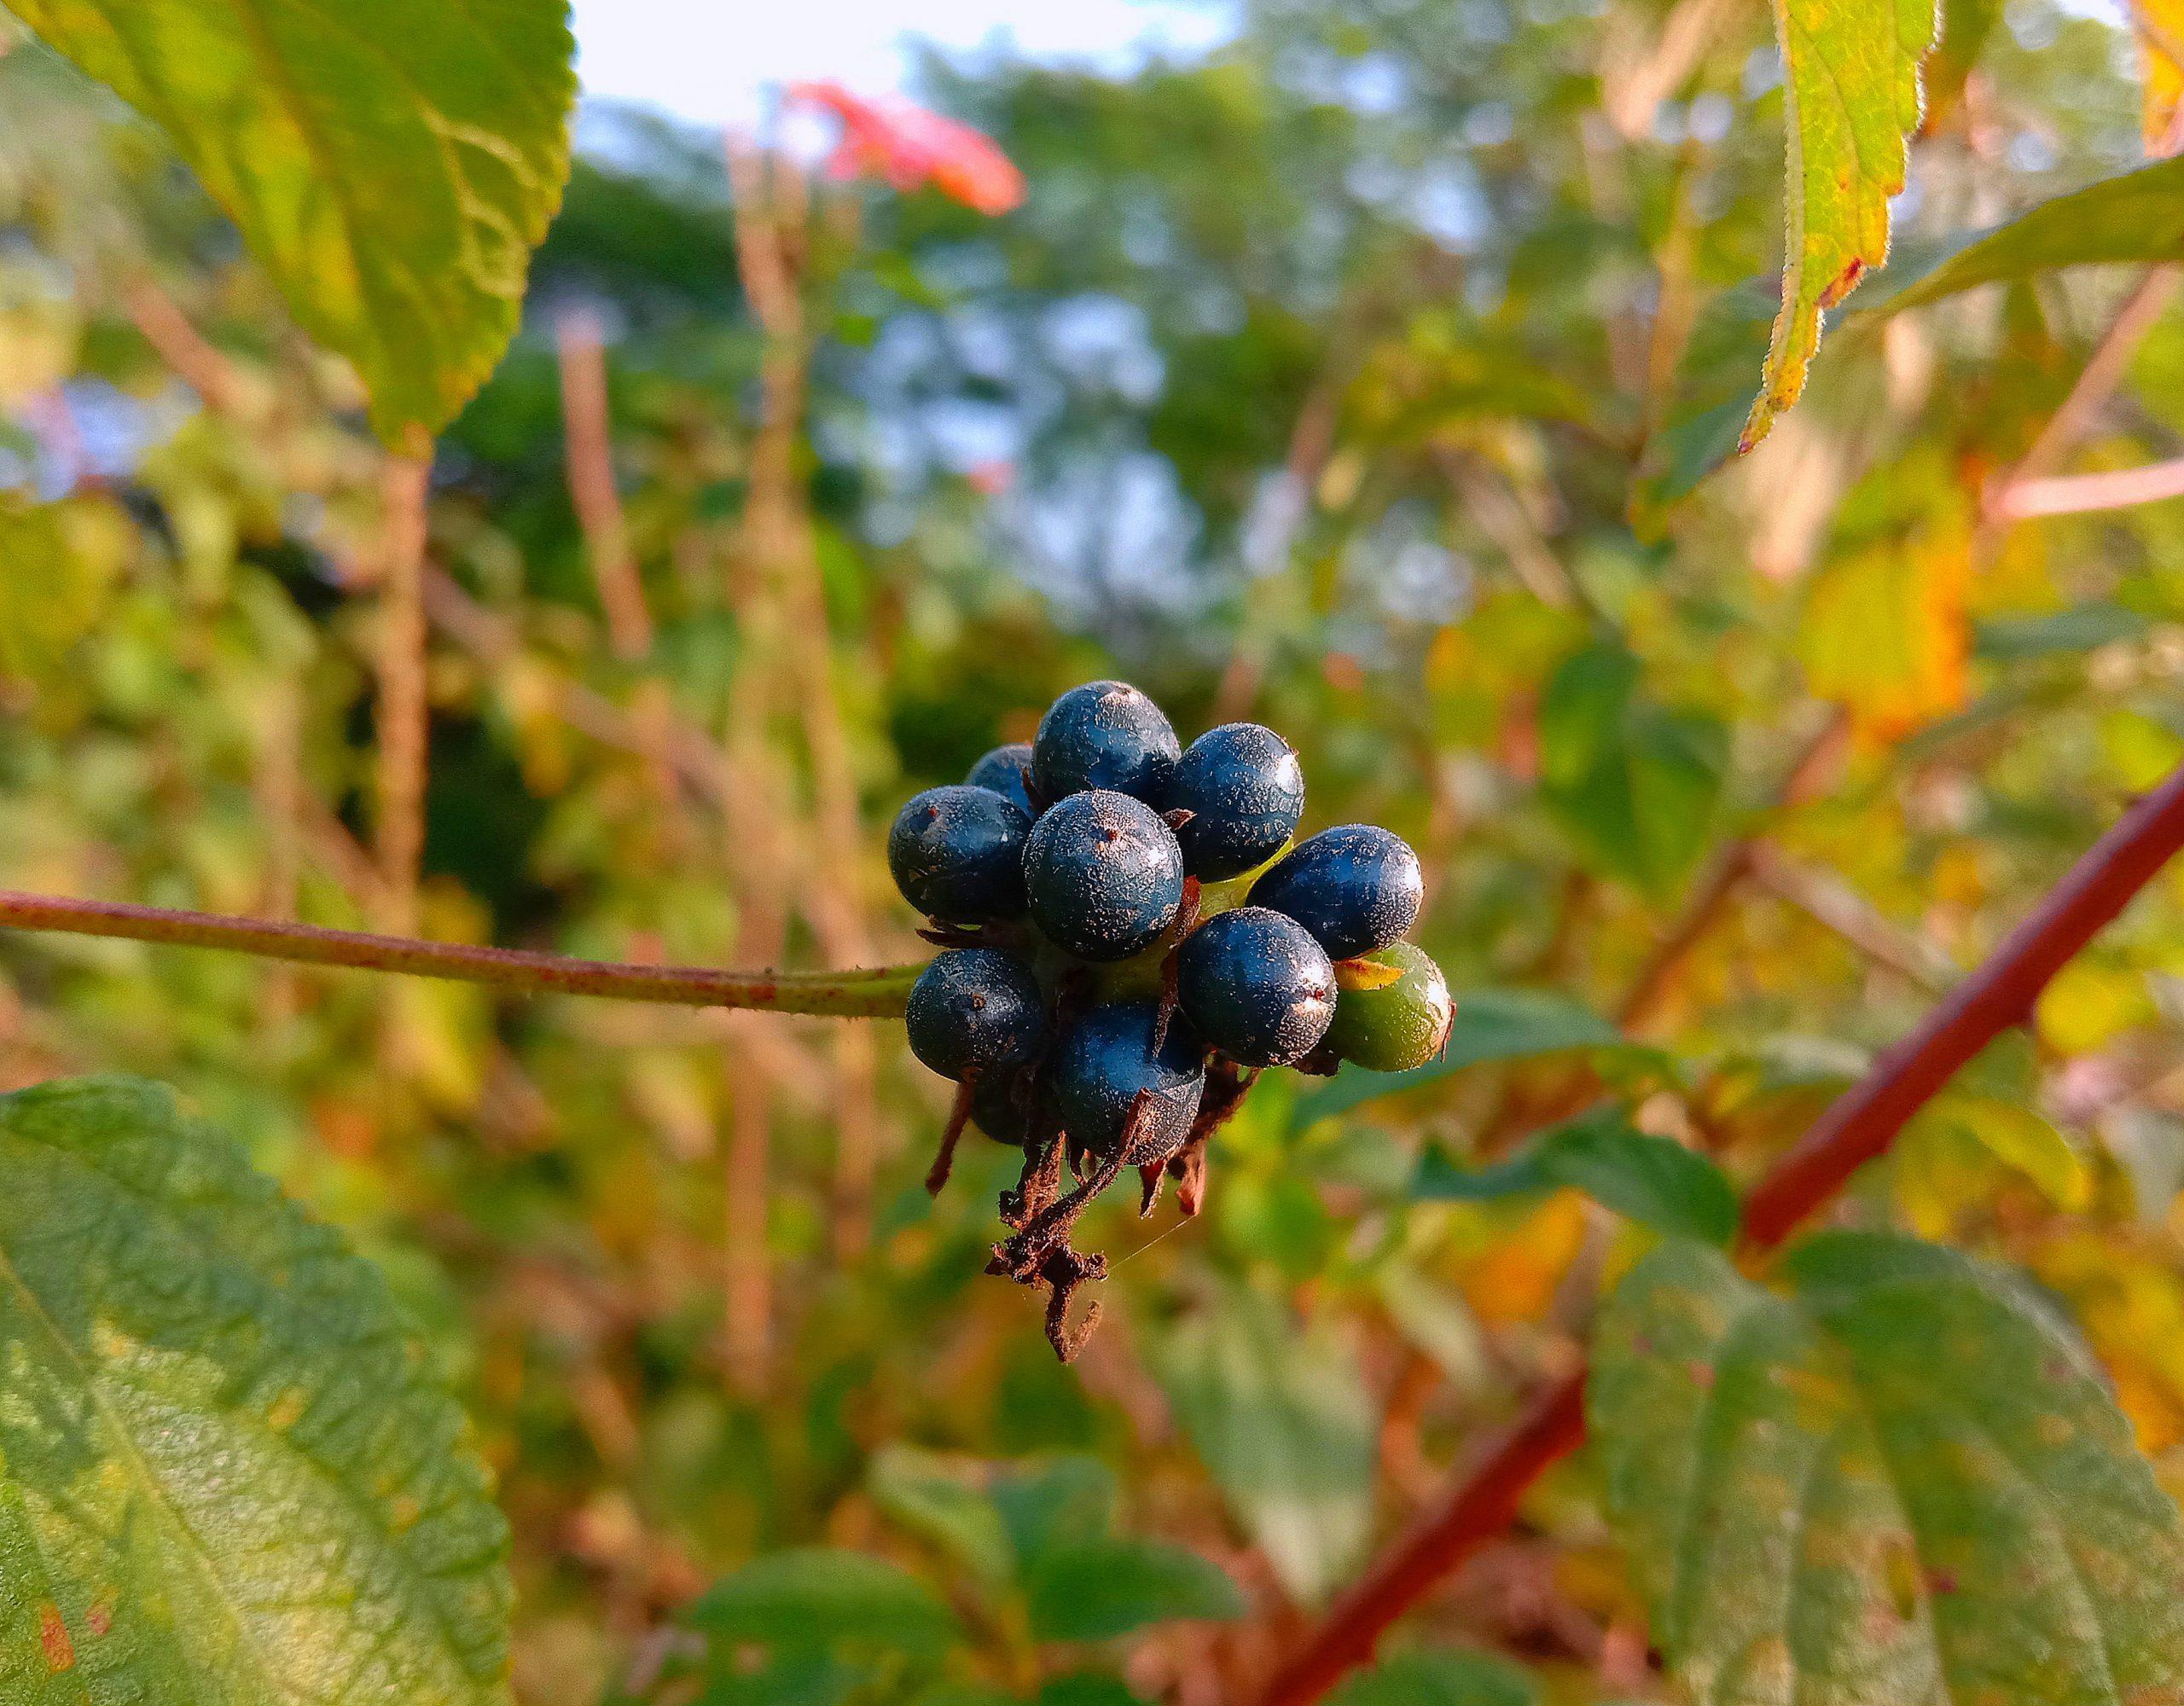 Black fruit on plant